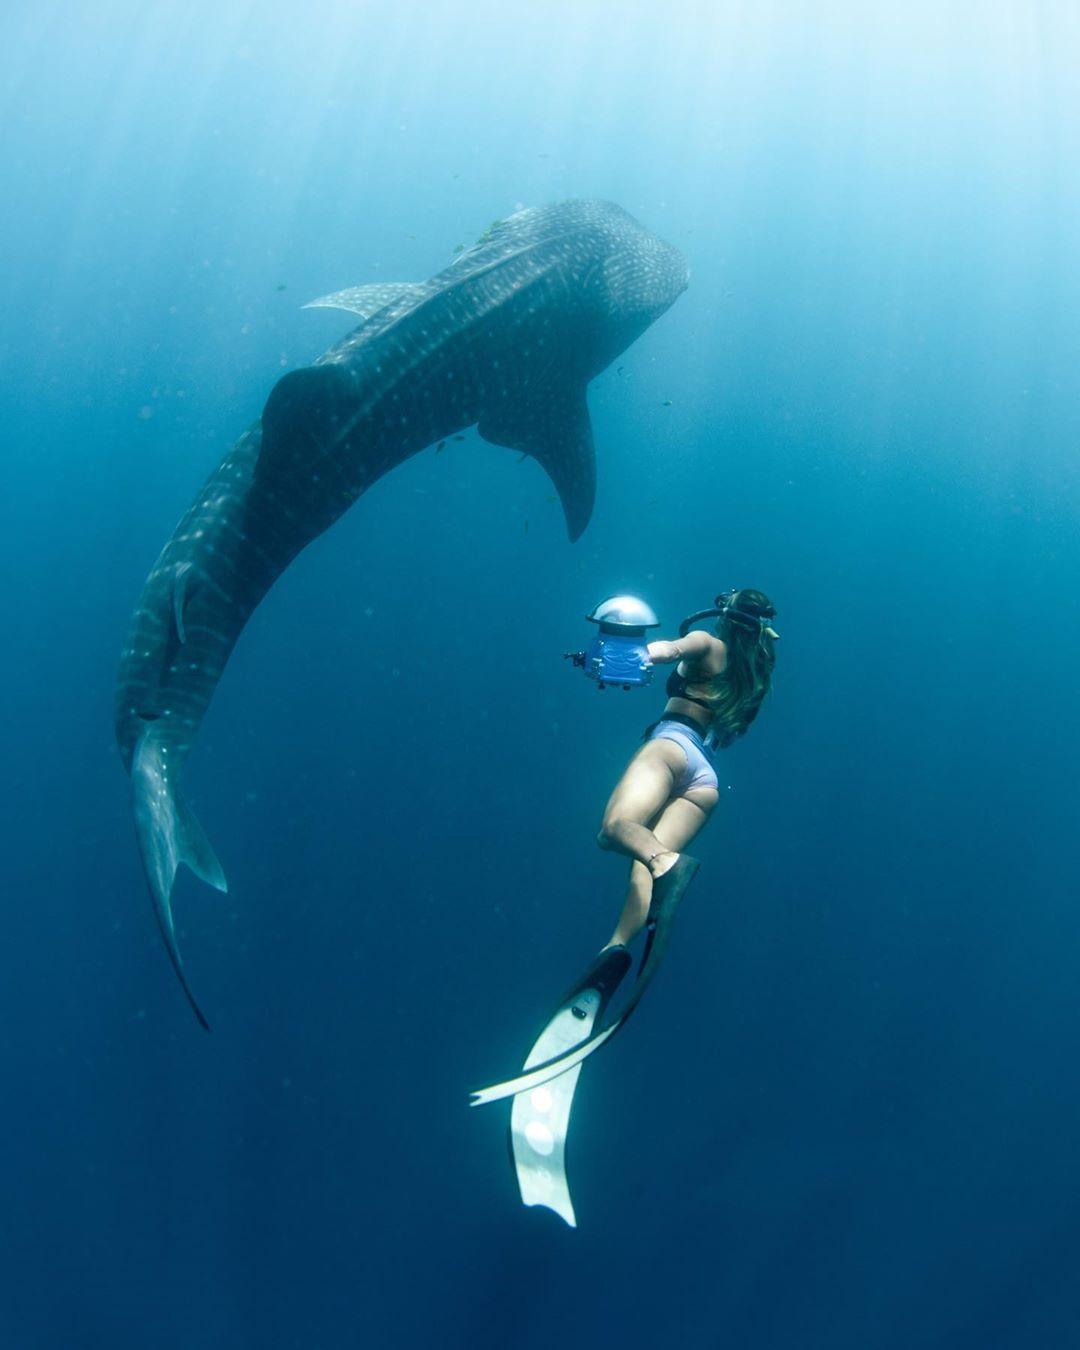 @oceanaimee - Ningaloo Reef